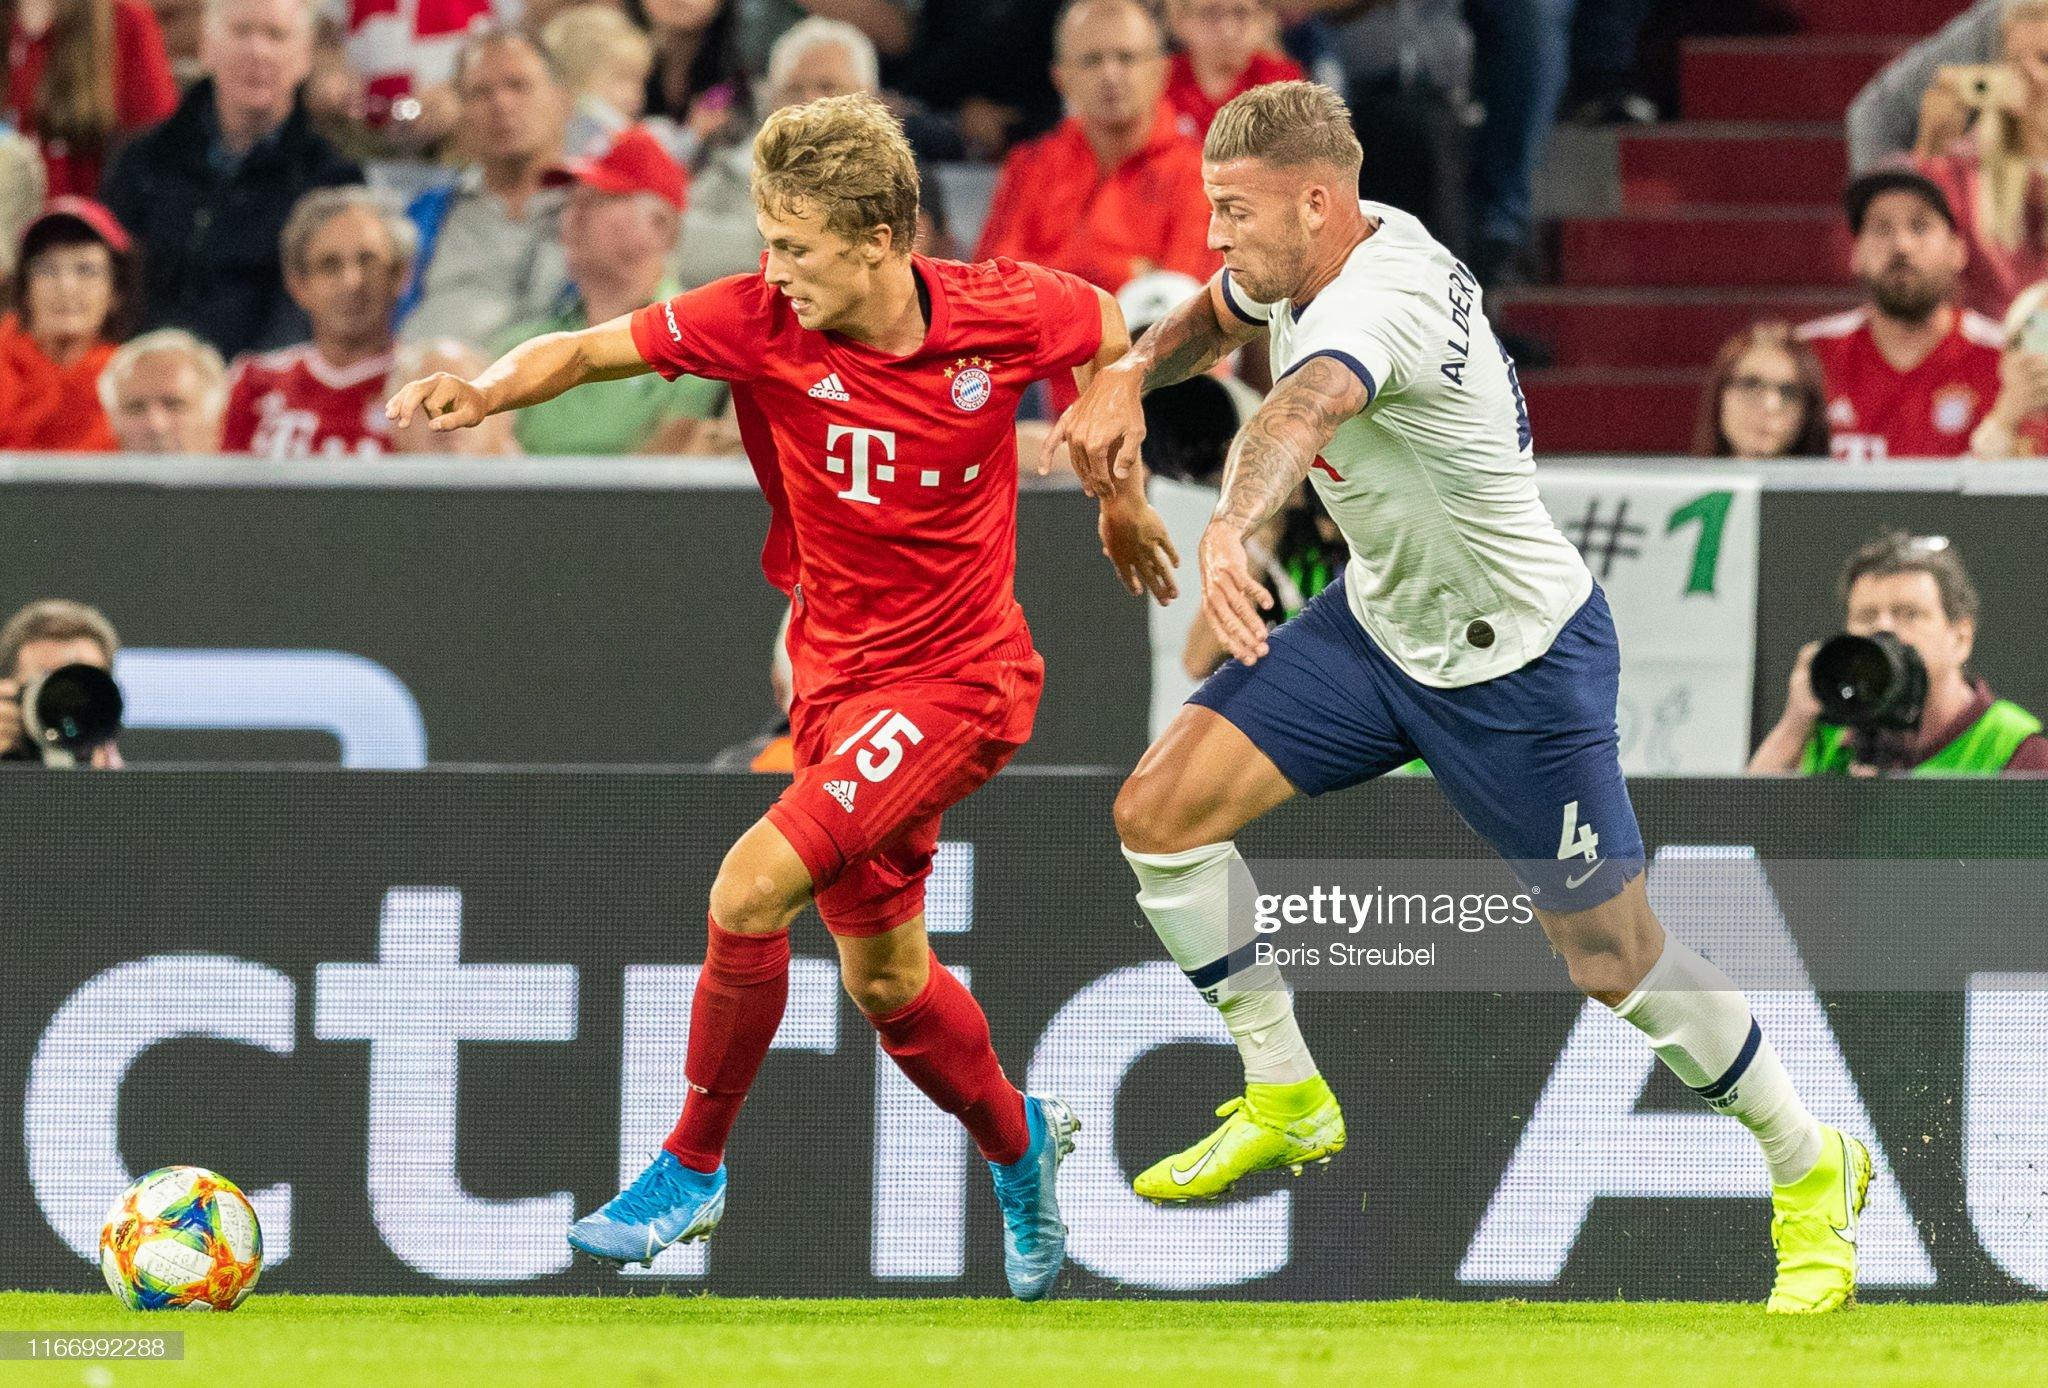 Tottenham v Bayern Munich Preview, prediction and odds